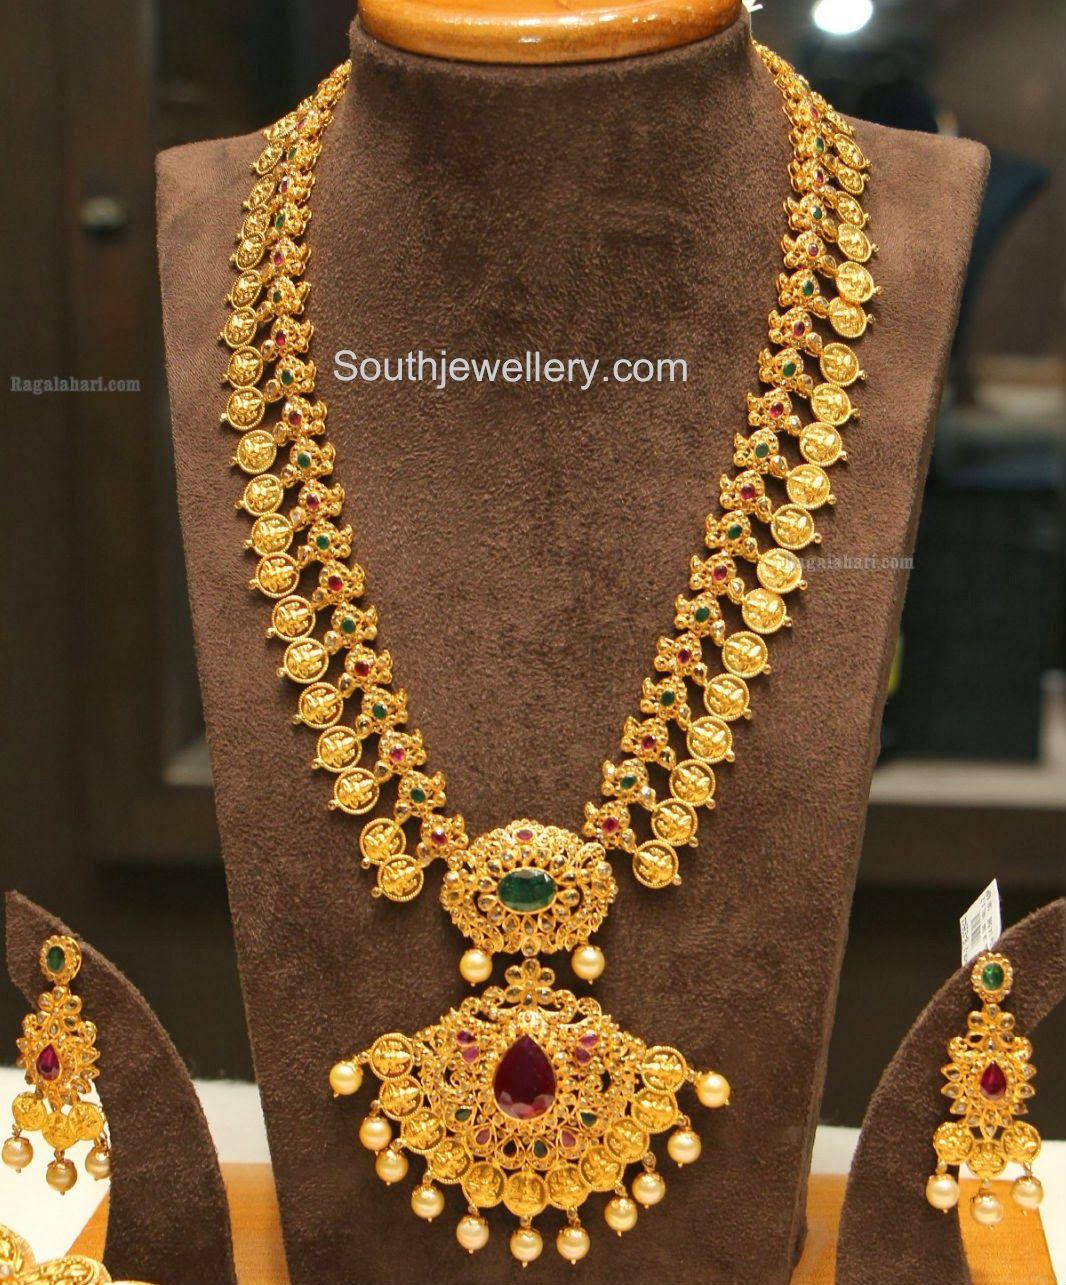 Latest gold necklace designs in grams pachi necklace latest jewellery - Blue Necklace Uncut Diamond Kasulaperu Jewellery Designslatest